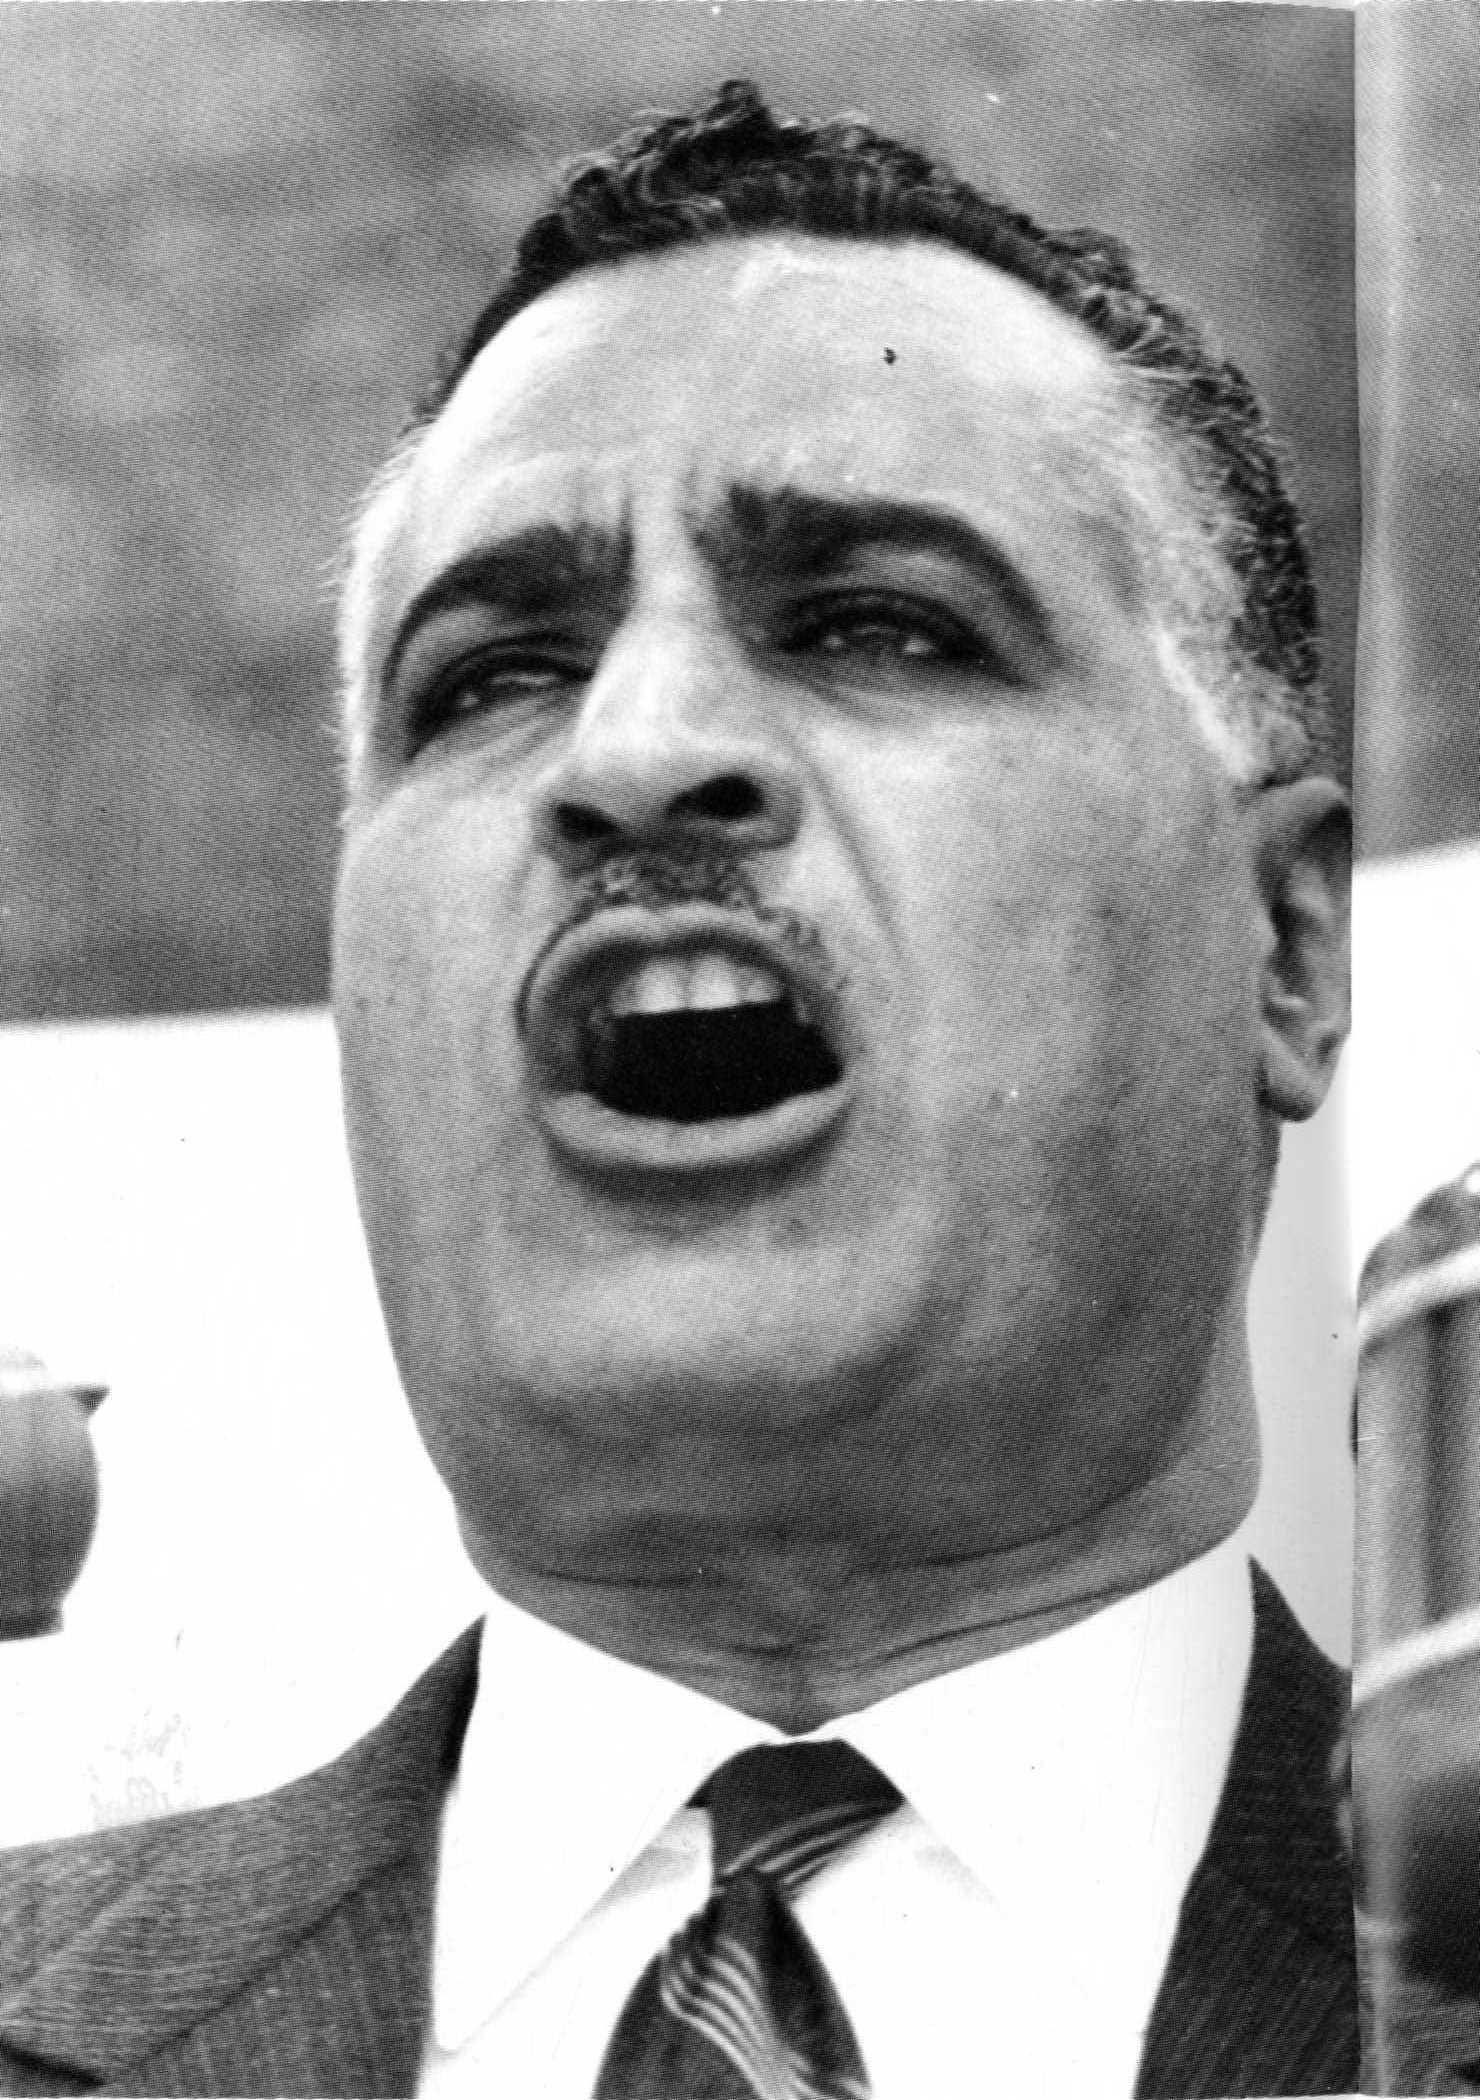 جمال عبد الناصر | President of egypt, Egypt civilization ...